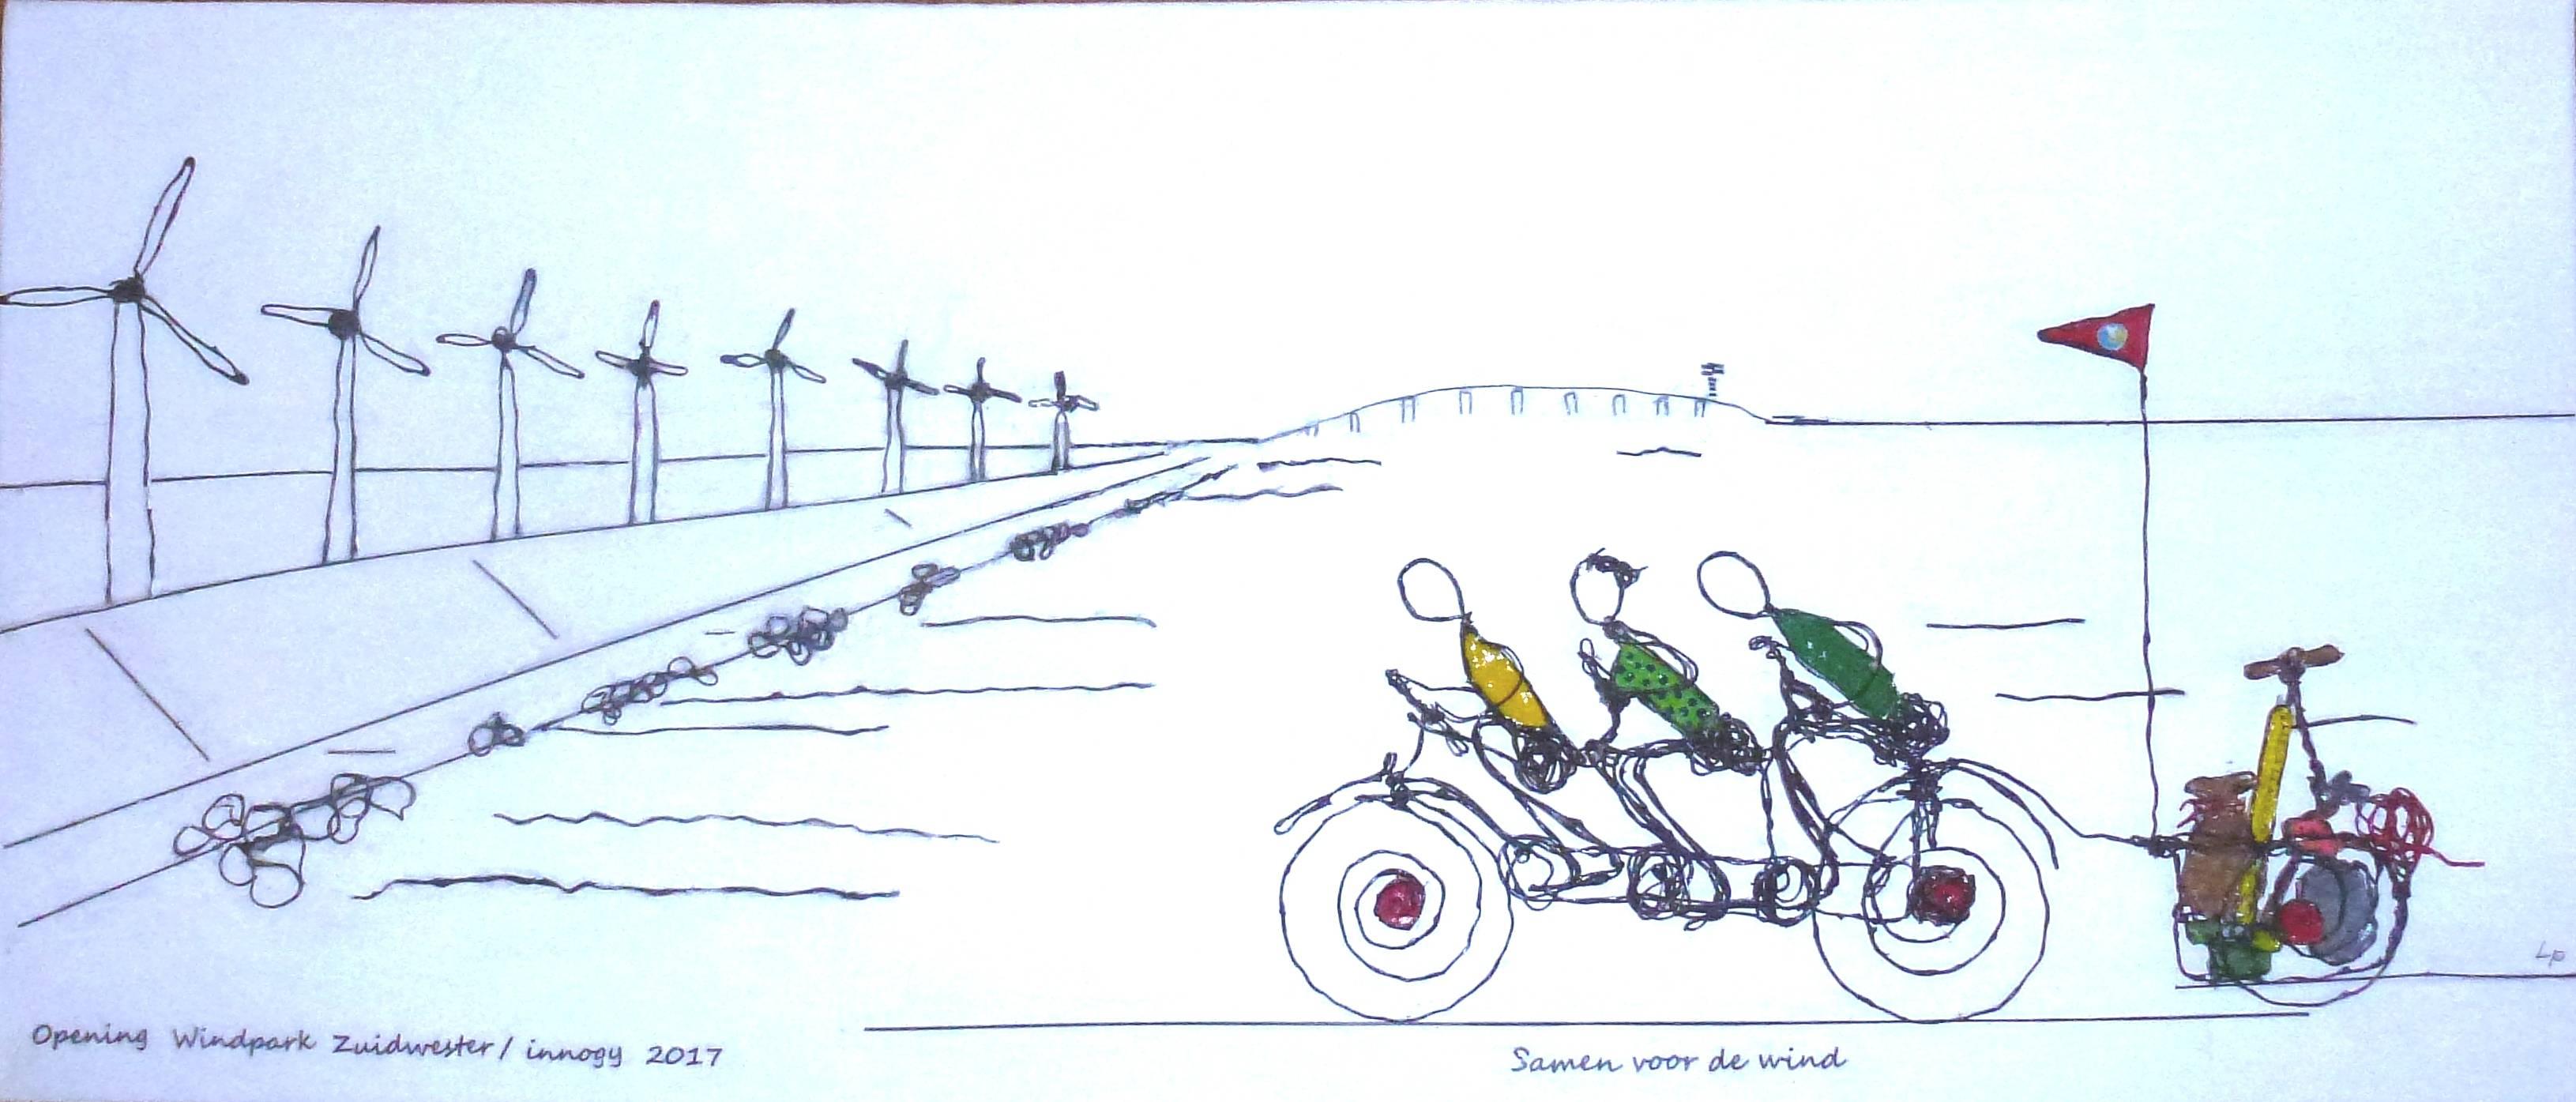 Opening Windpark Zuidwester/innogy